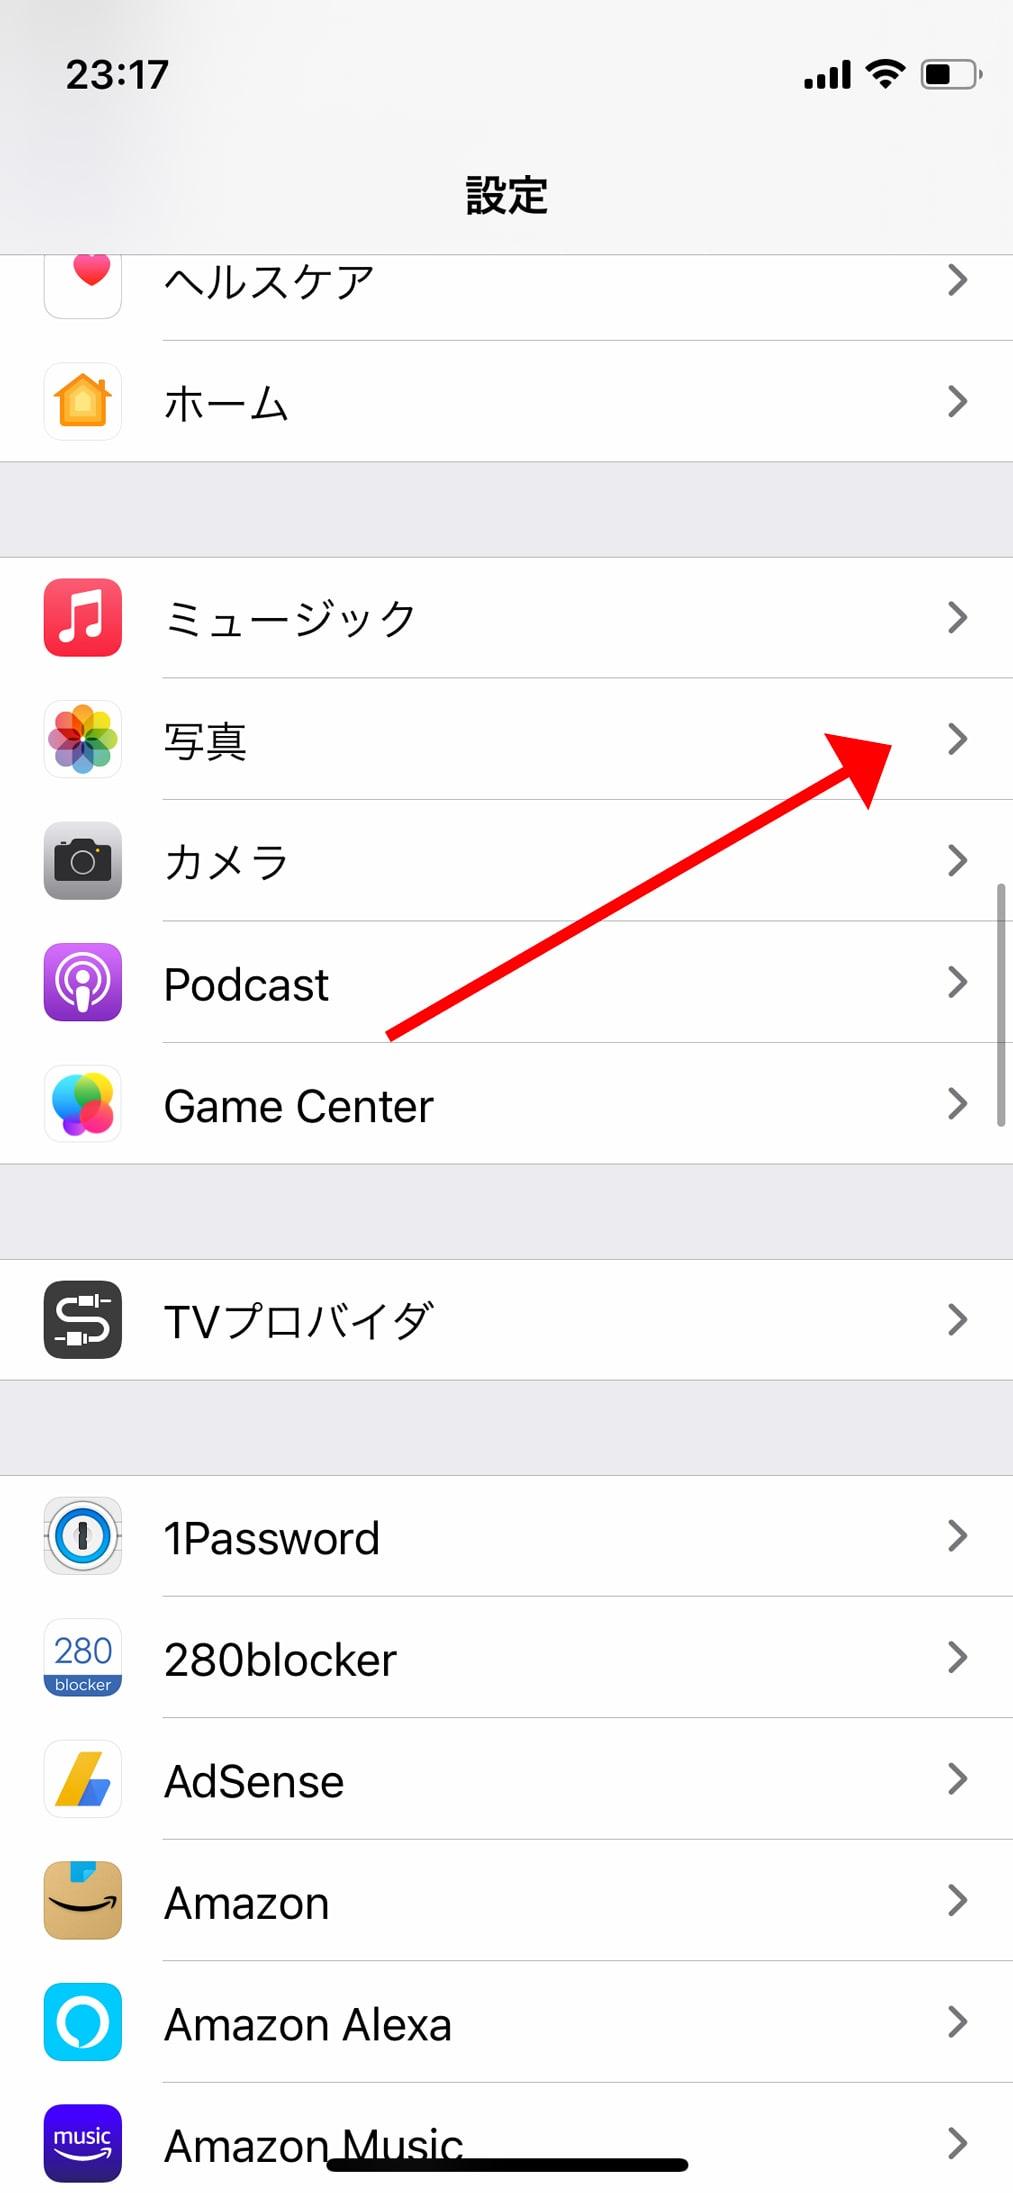 iCloudの通信を制限して、iPhoneのパケット通信を節約する方法